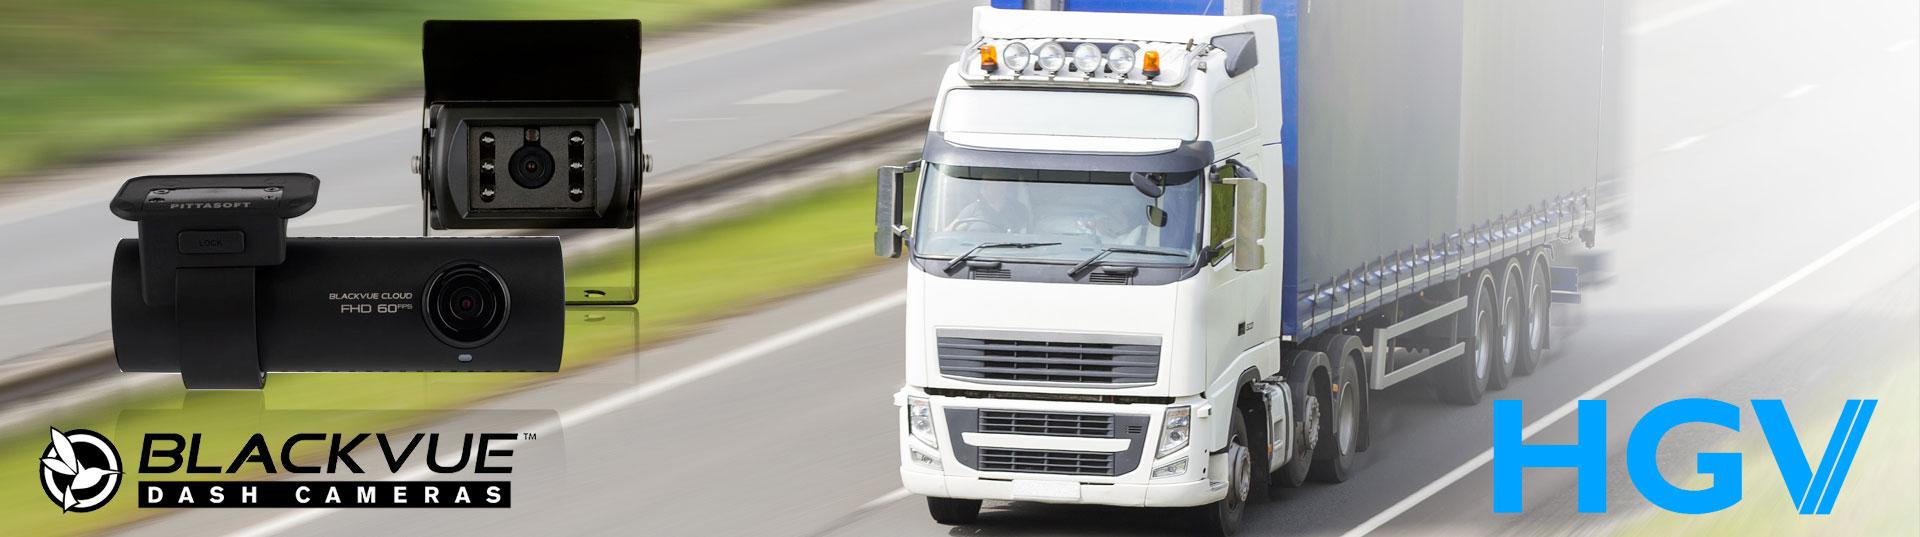 دوربین کامیون اتوبوس خودرو سنگین